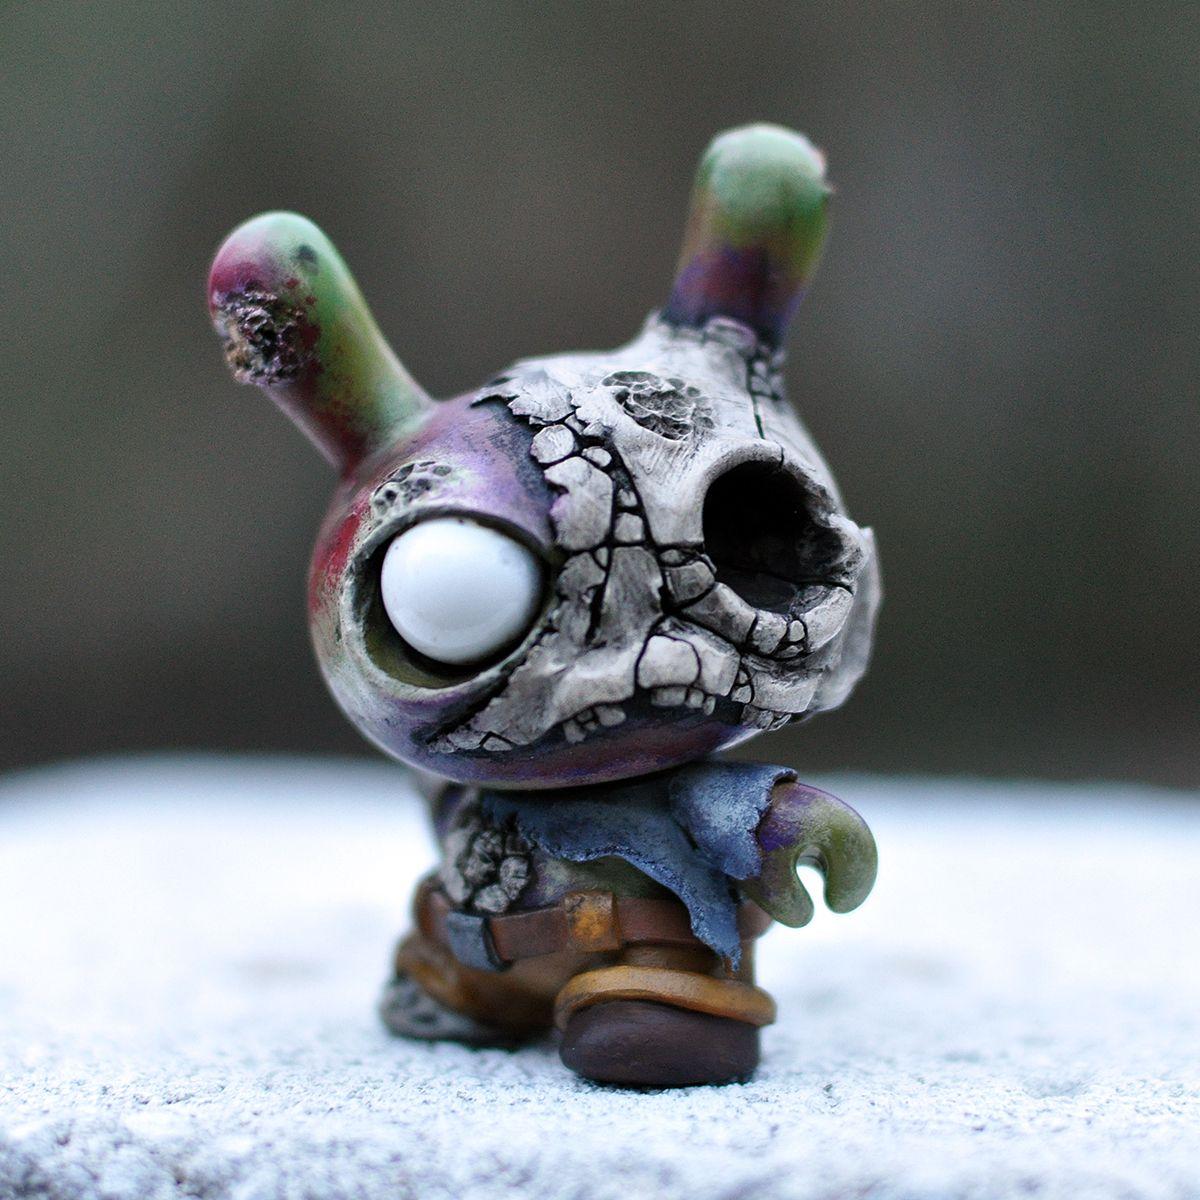 Fosl Zombie Grey Zombiez Series By Komega Vinyl Art Toys Art Toy Clay Projects